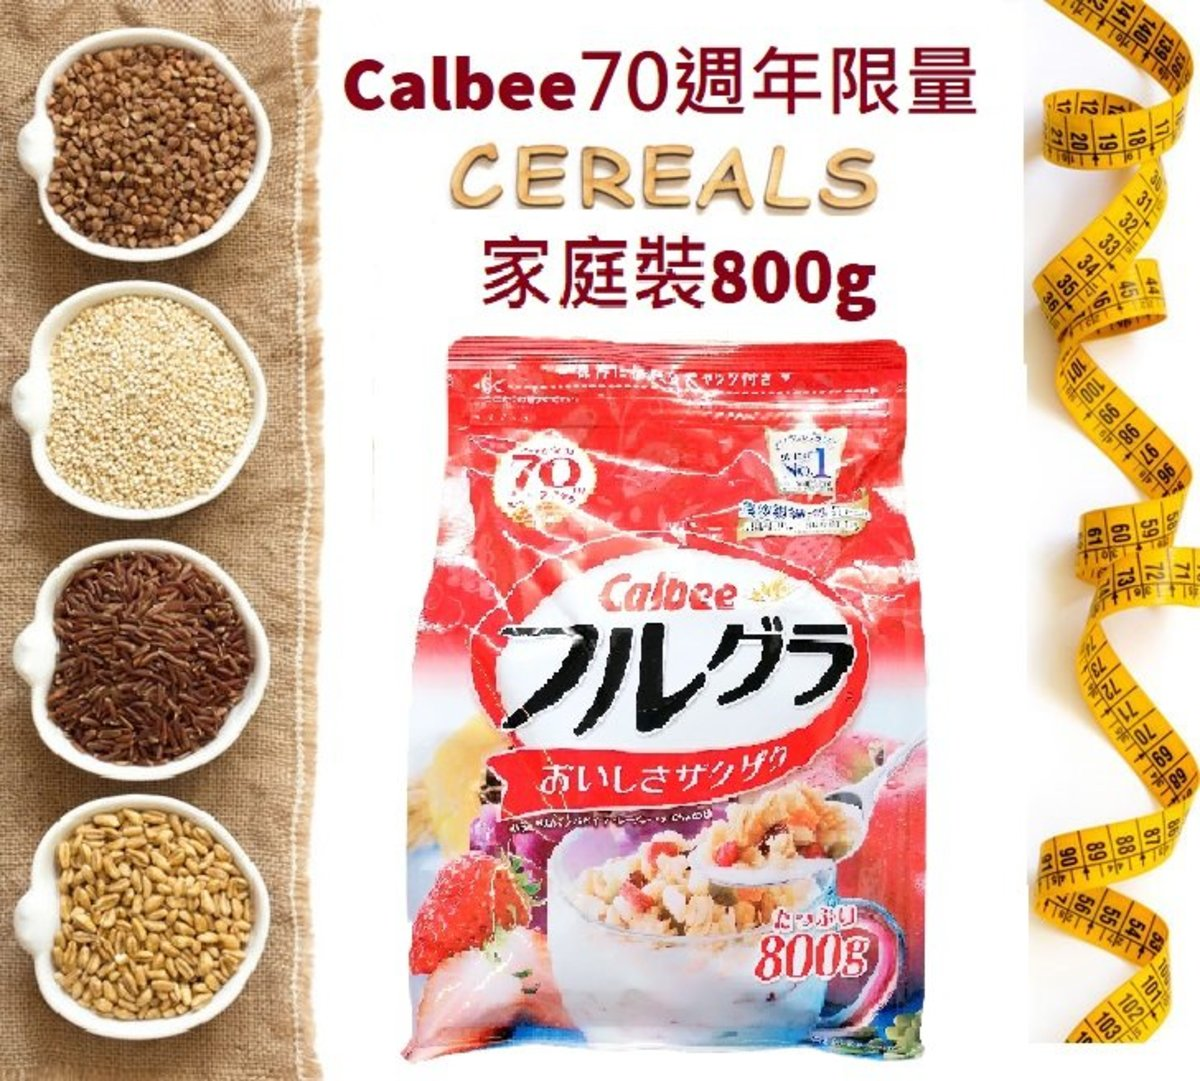 Calbee 70週年限量 營養穀物早餐(家庭裝800g)